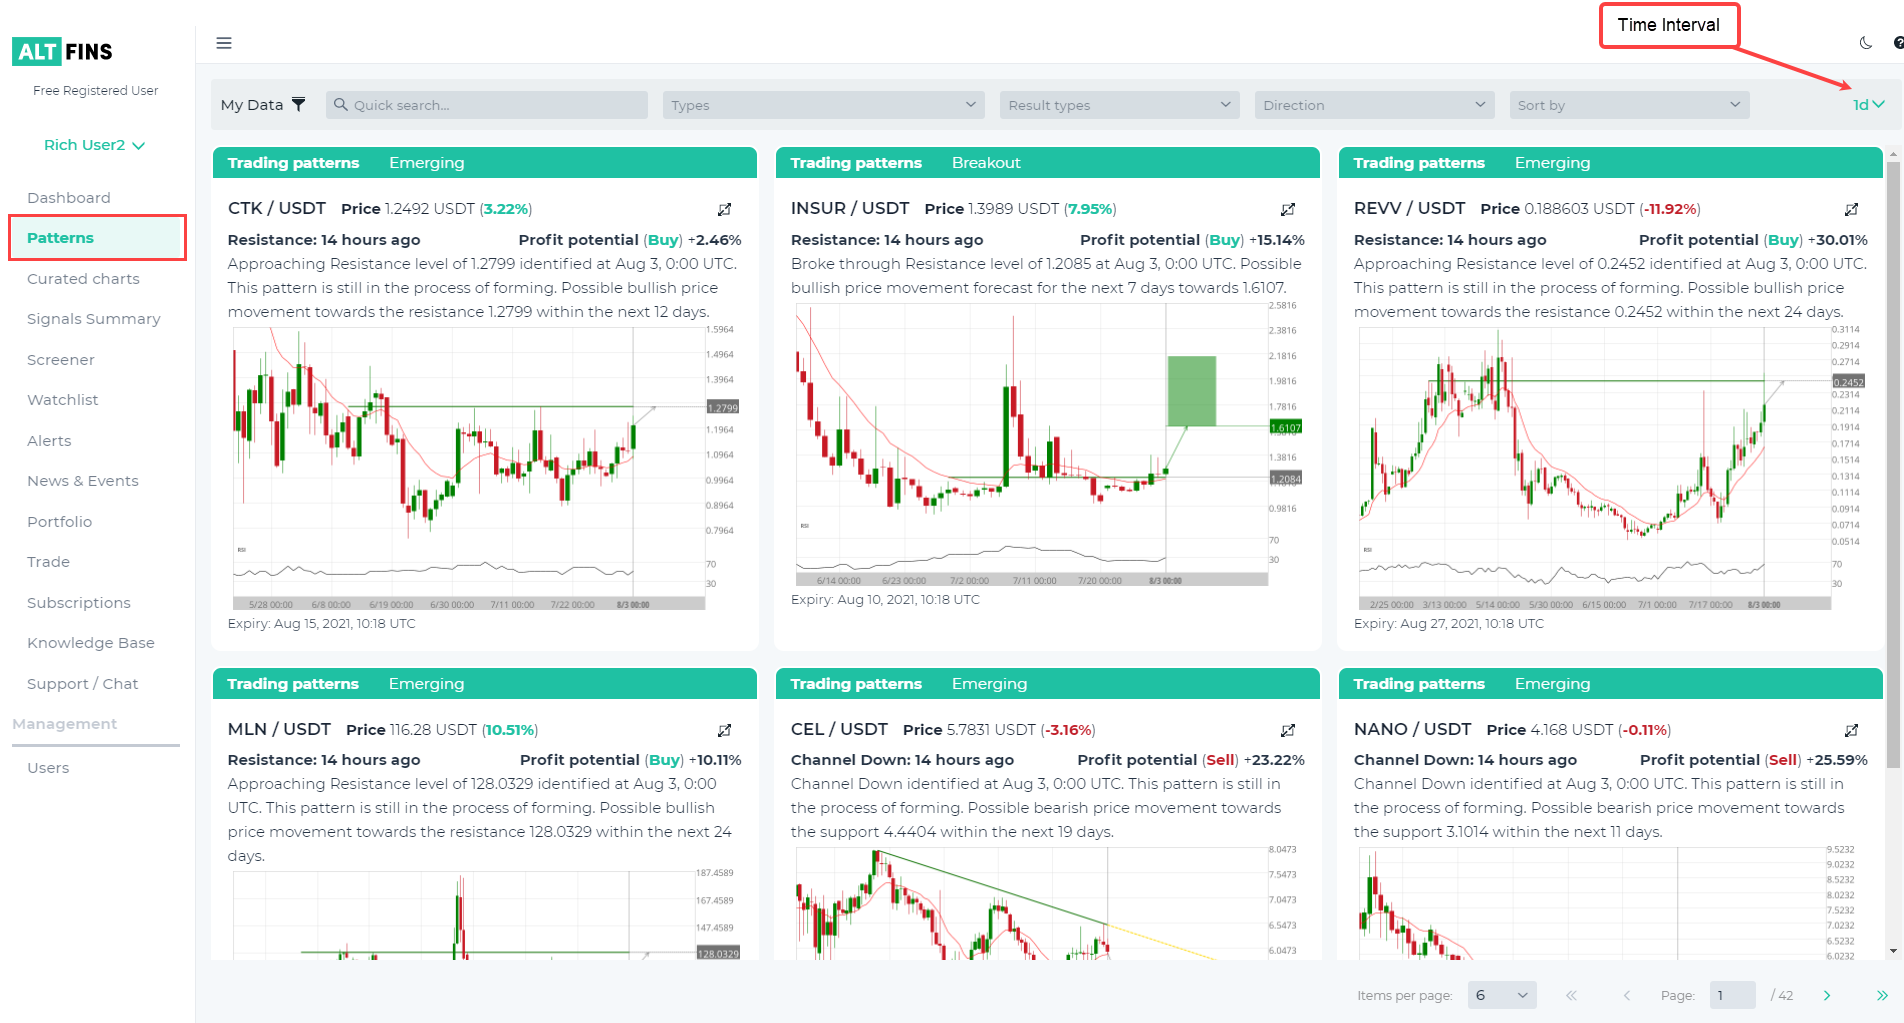 altFINS chart pattern page